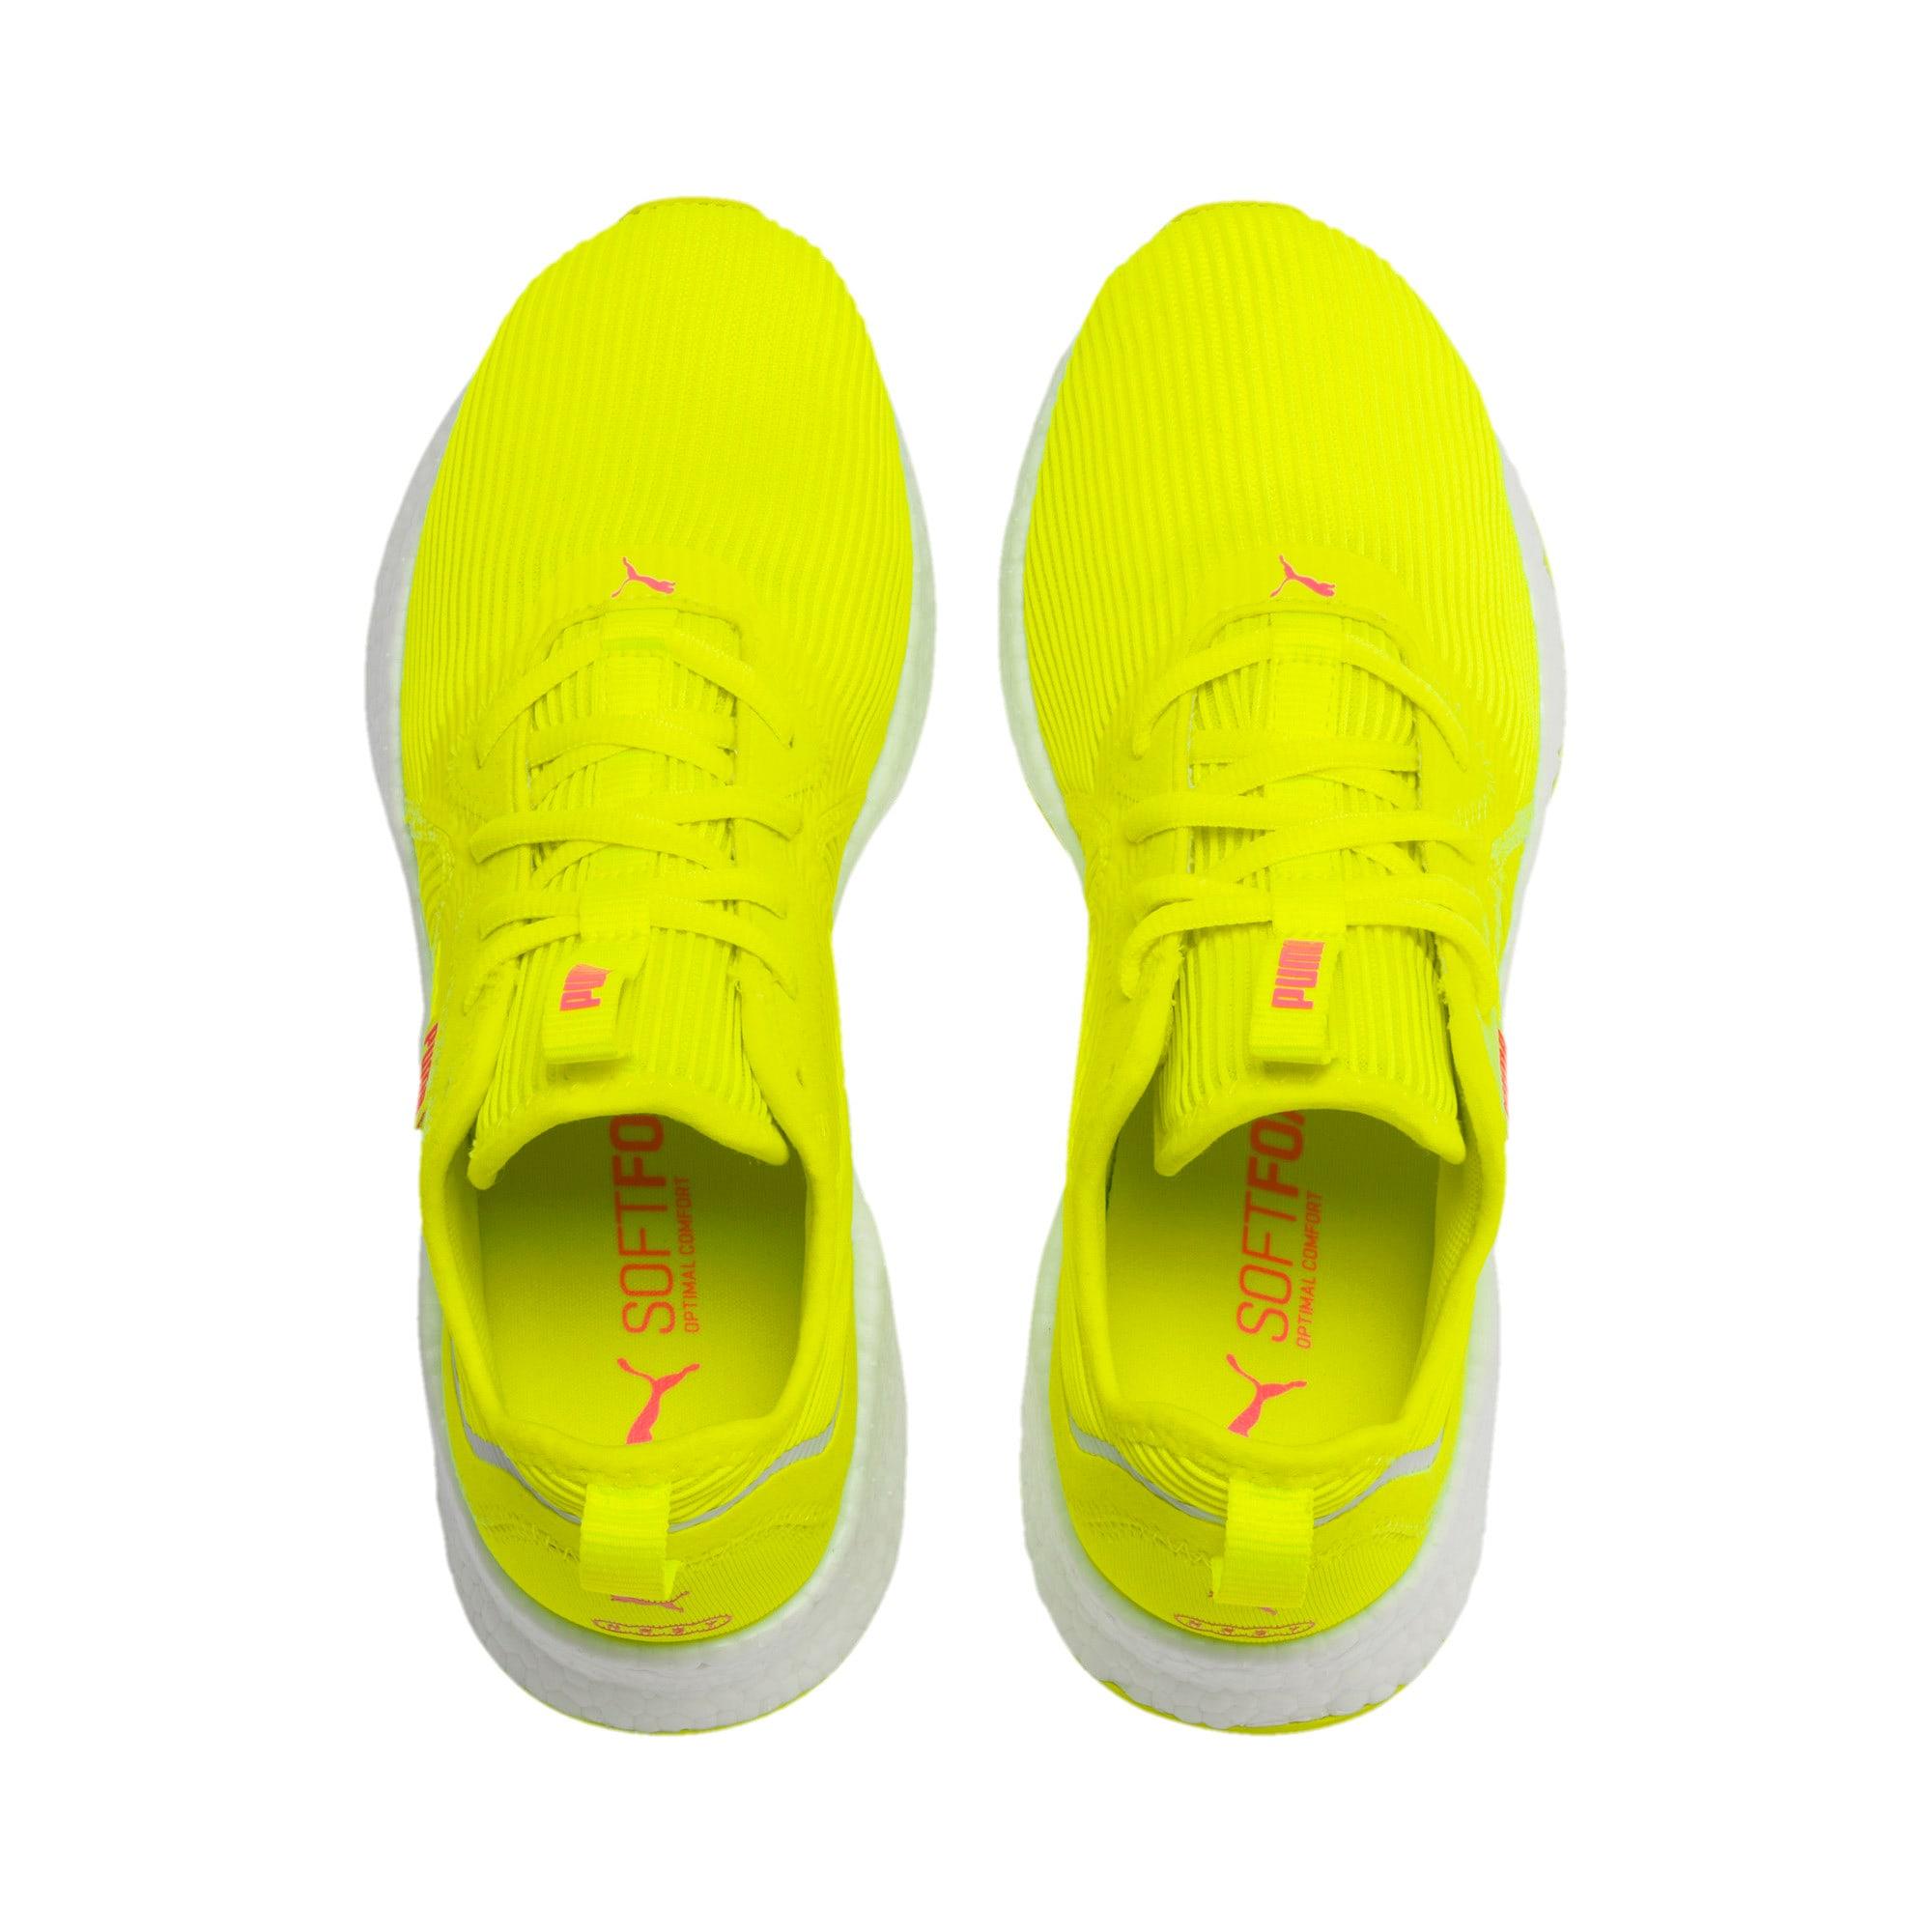 Miniatura 7 de Zapatos para correr NRGY Star Femme para mujer, Yellow Alert-Pink Alert, mediano